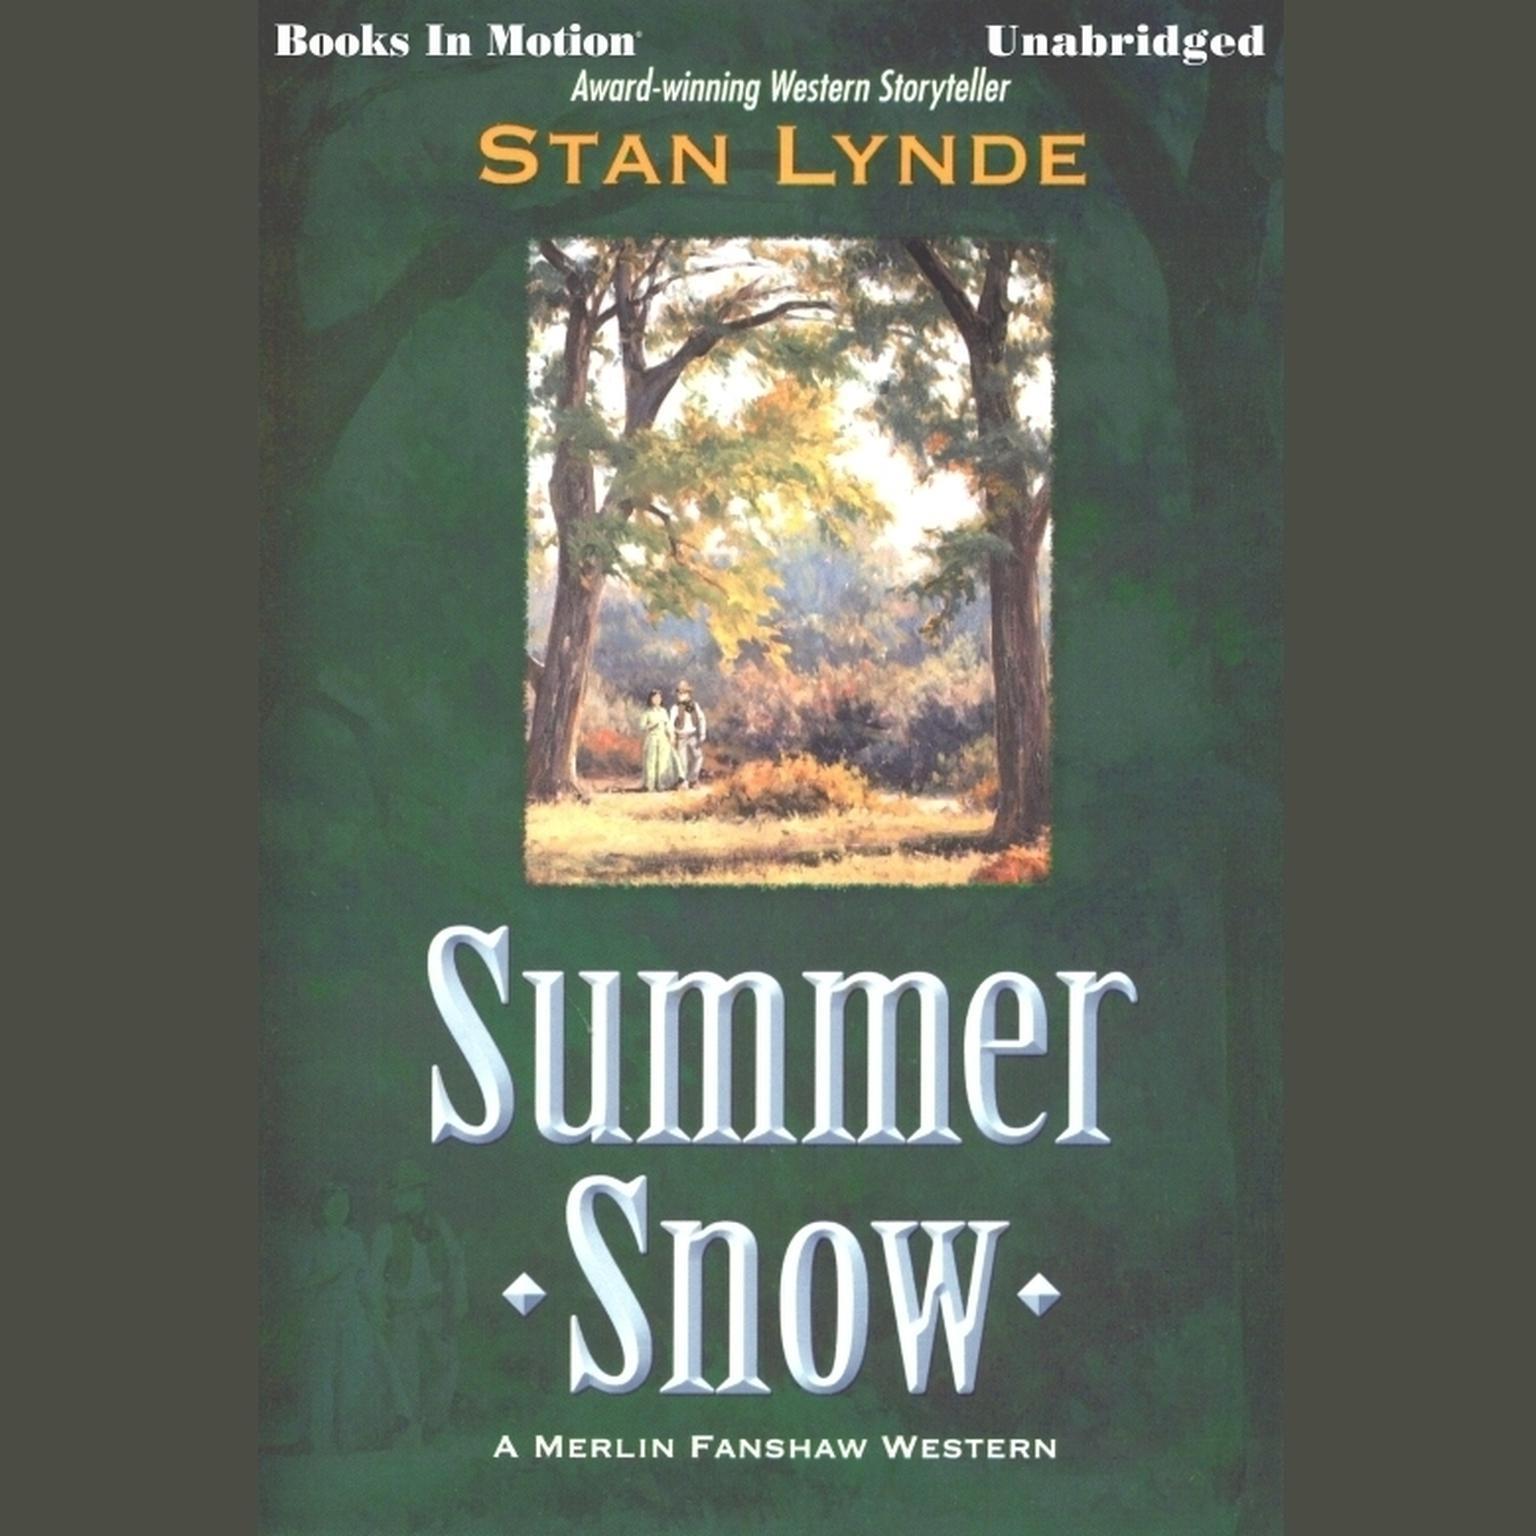 Summer Snow Audiobook, by Stan Lynde